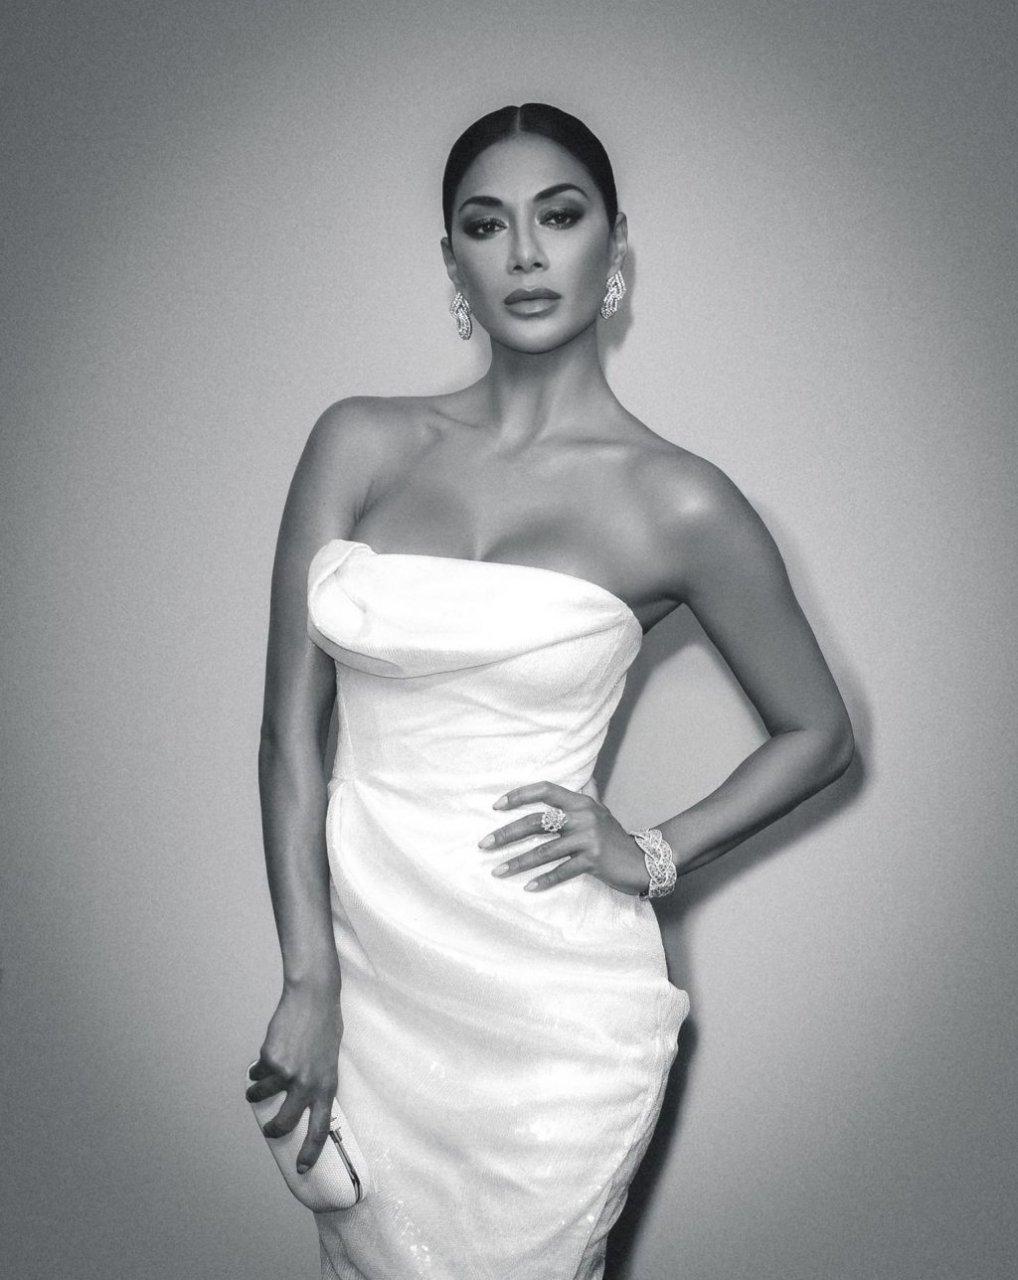 Nicole Scherzinger Sexy (5 New Photos)